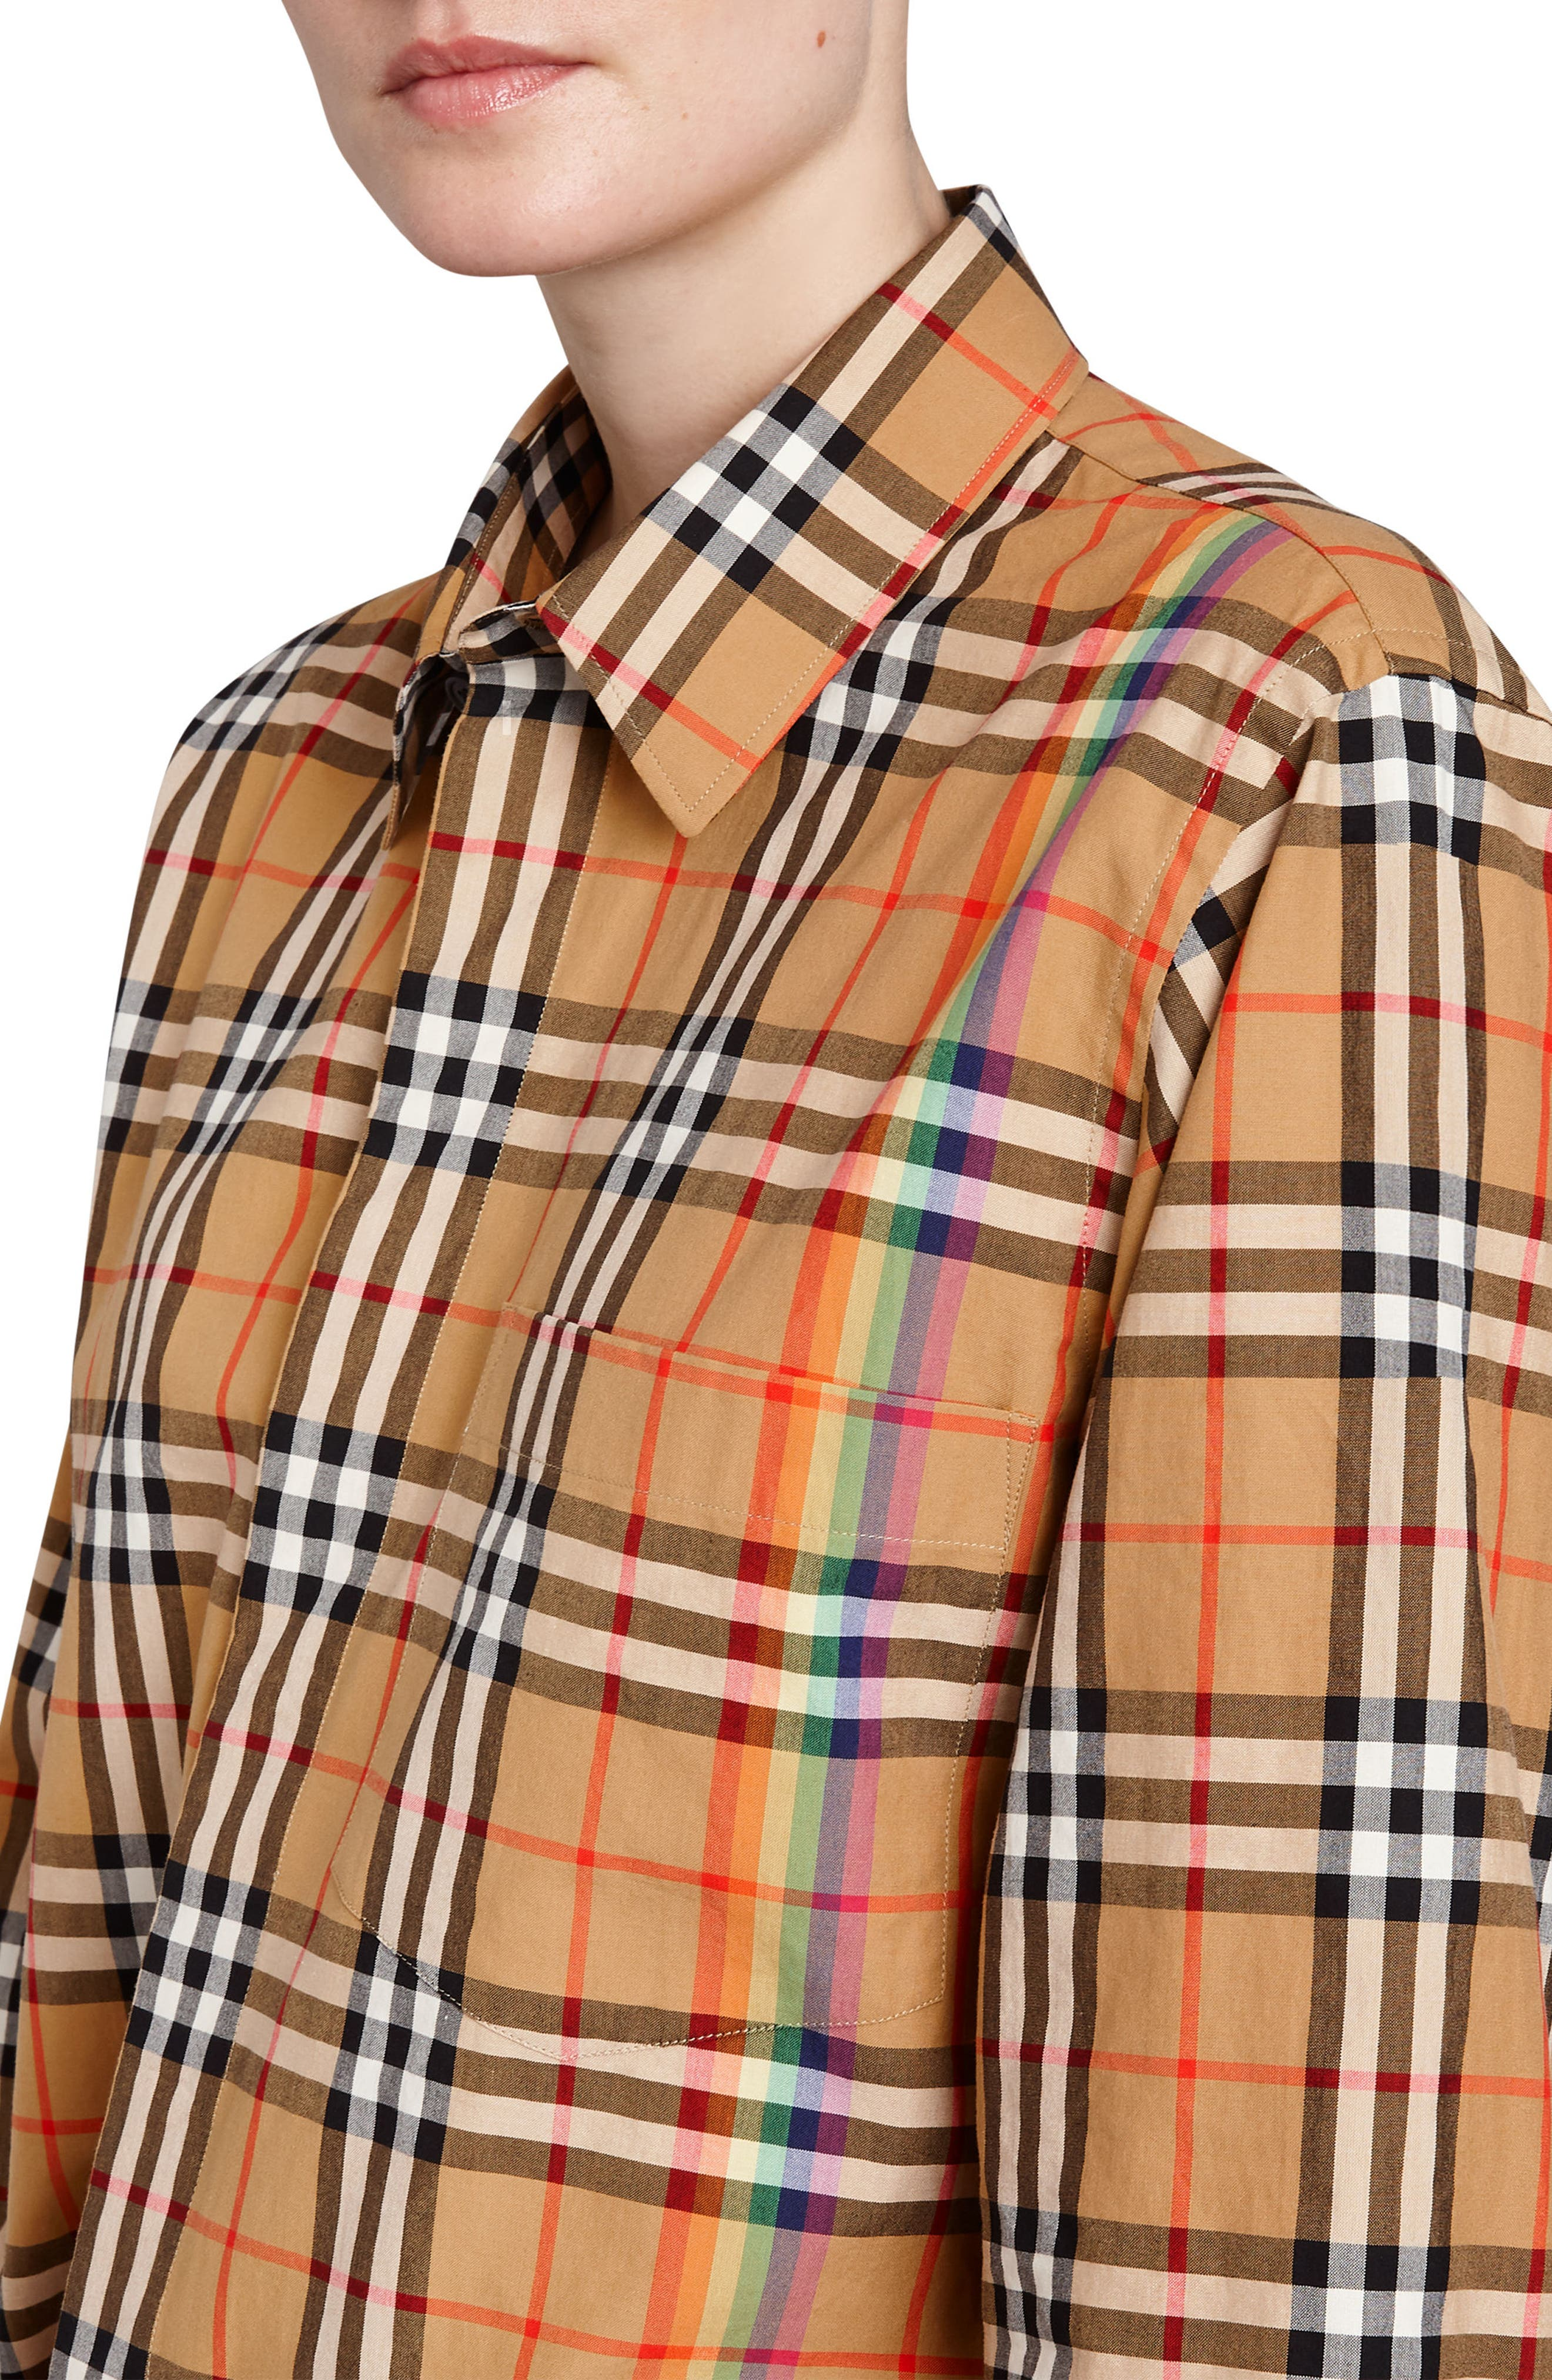 BURBERRY,                             Rainbow Check Shirt,                             Alternate thumbnail 4, color,                             254